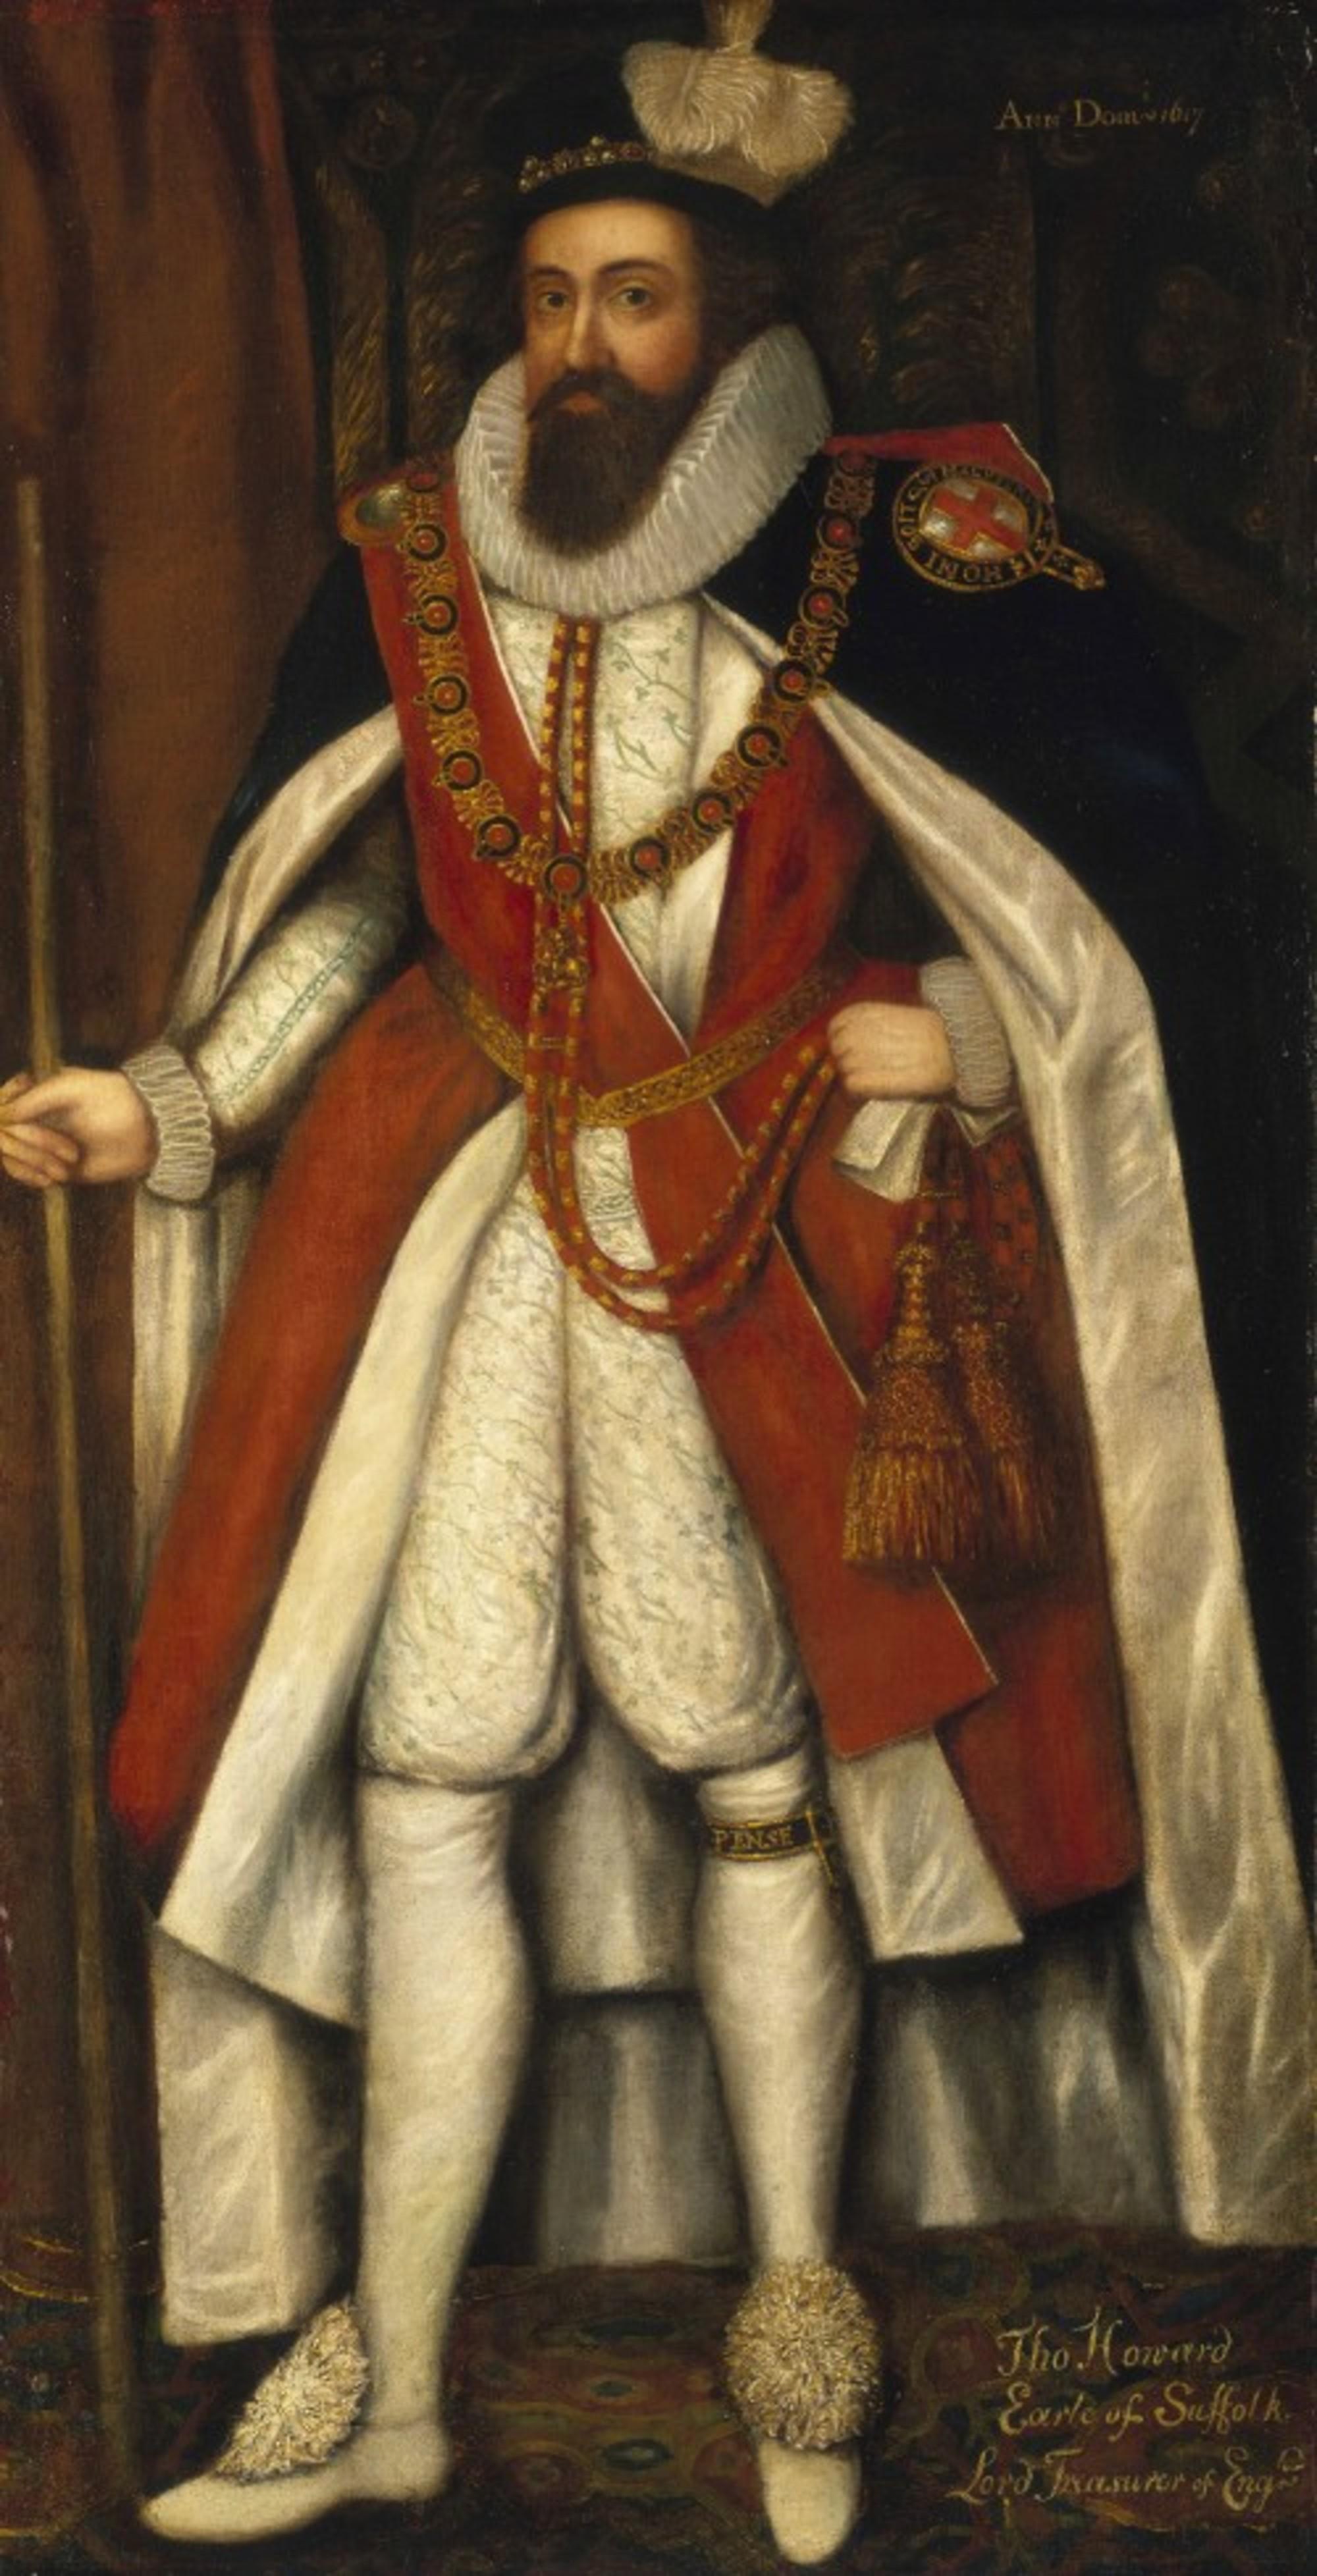 Thomas-Howard-1561-1626-1st-Earl-of-Suffolk-RMG-BHC2788.jpg